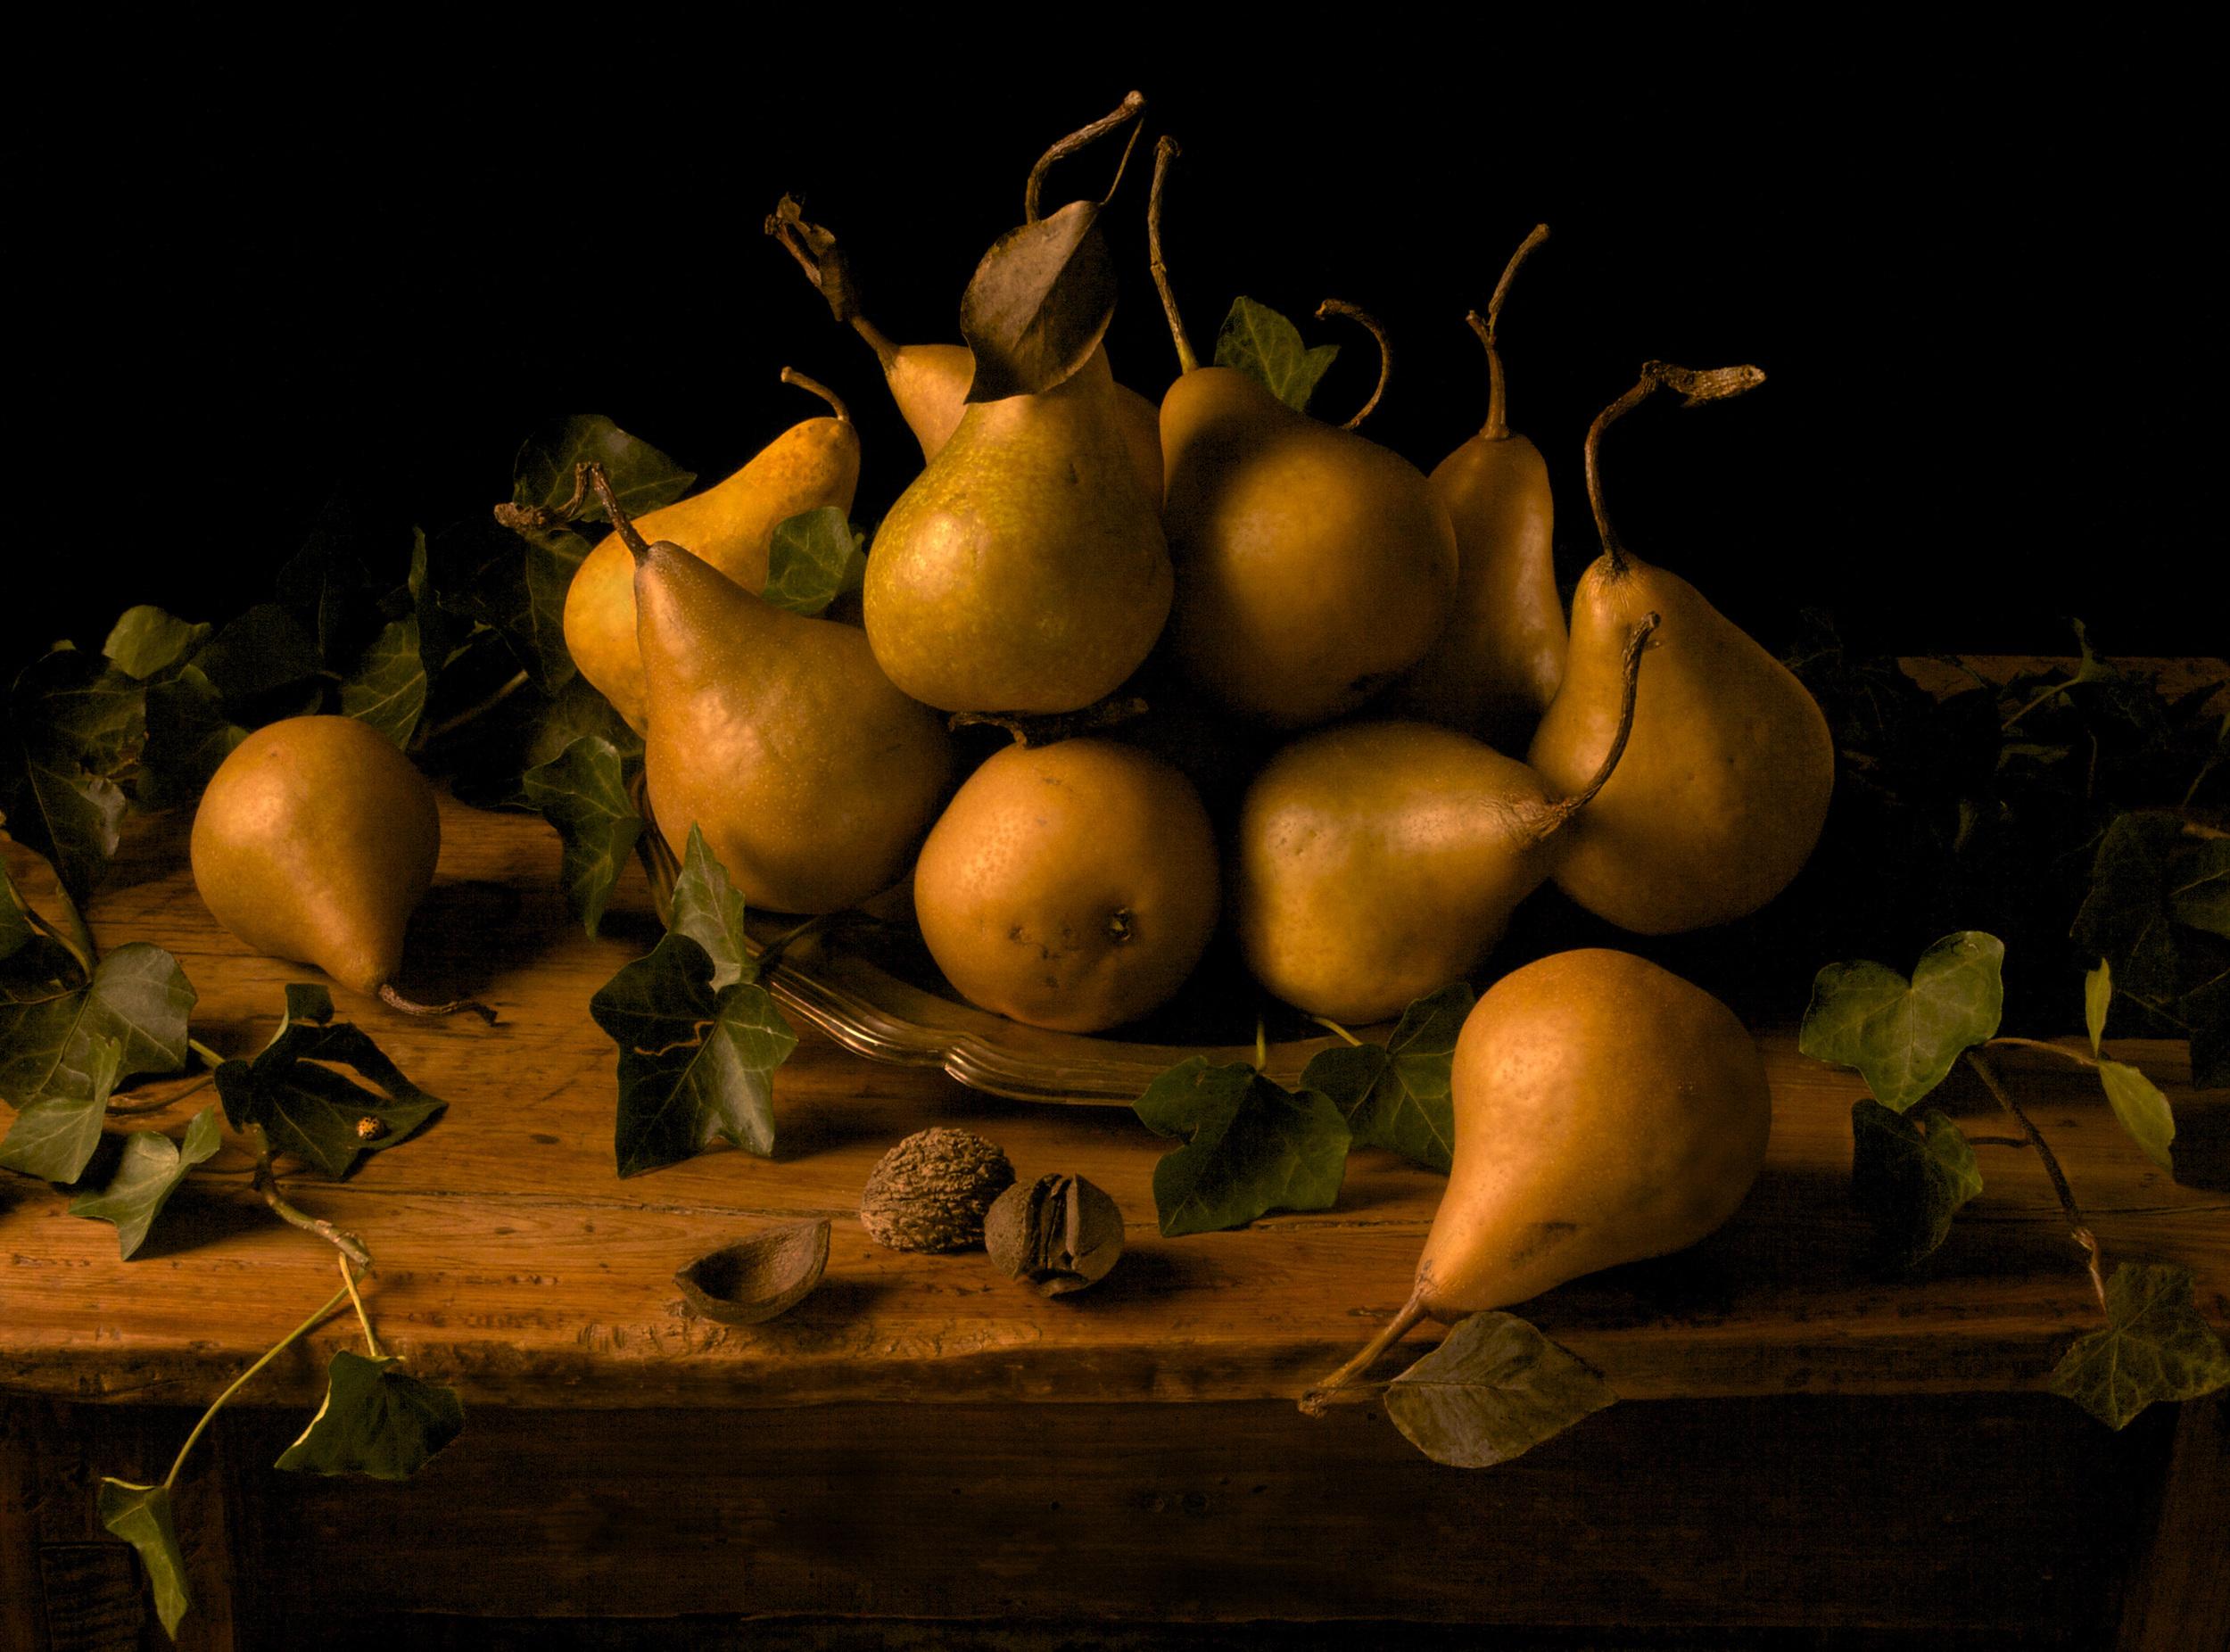 Pears, 2010